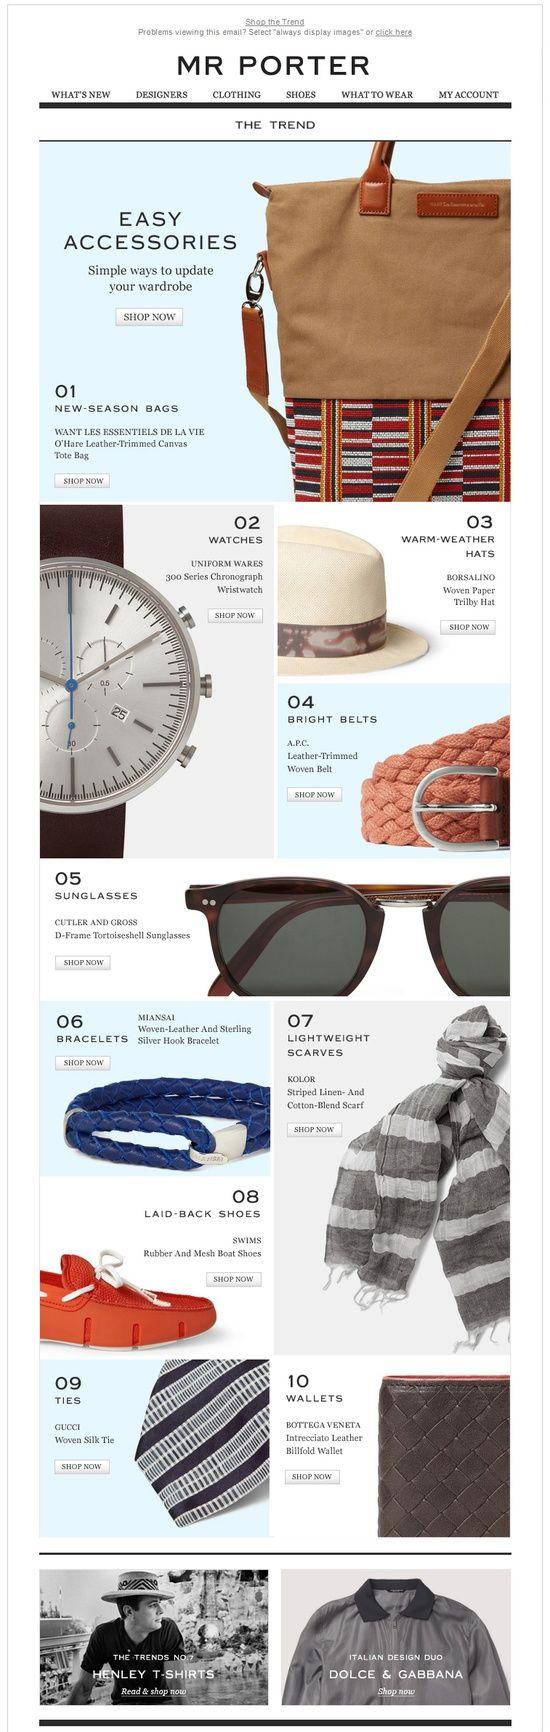 Newsletter Graphic Design. E-commerce. Fashion. Mr. | http://amazingwebdesignideasbrendon.blogspot.com